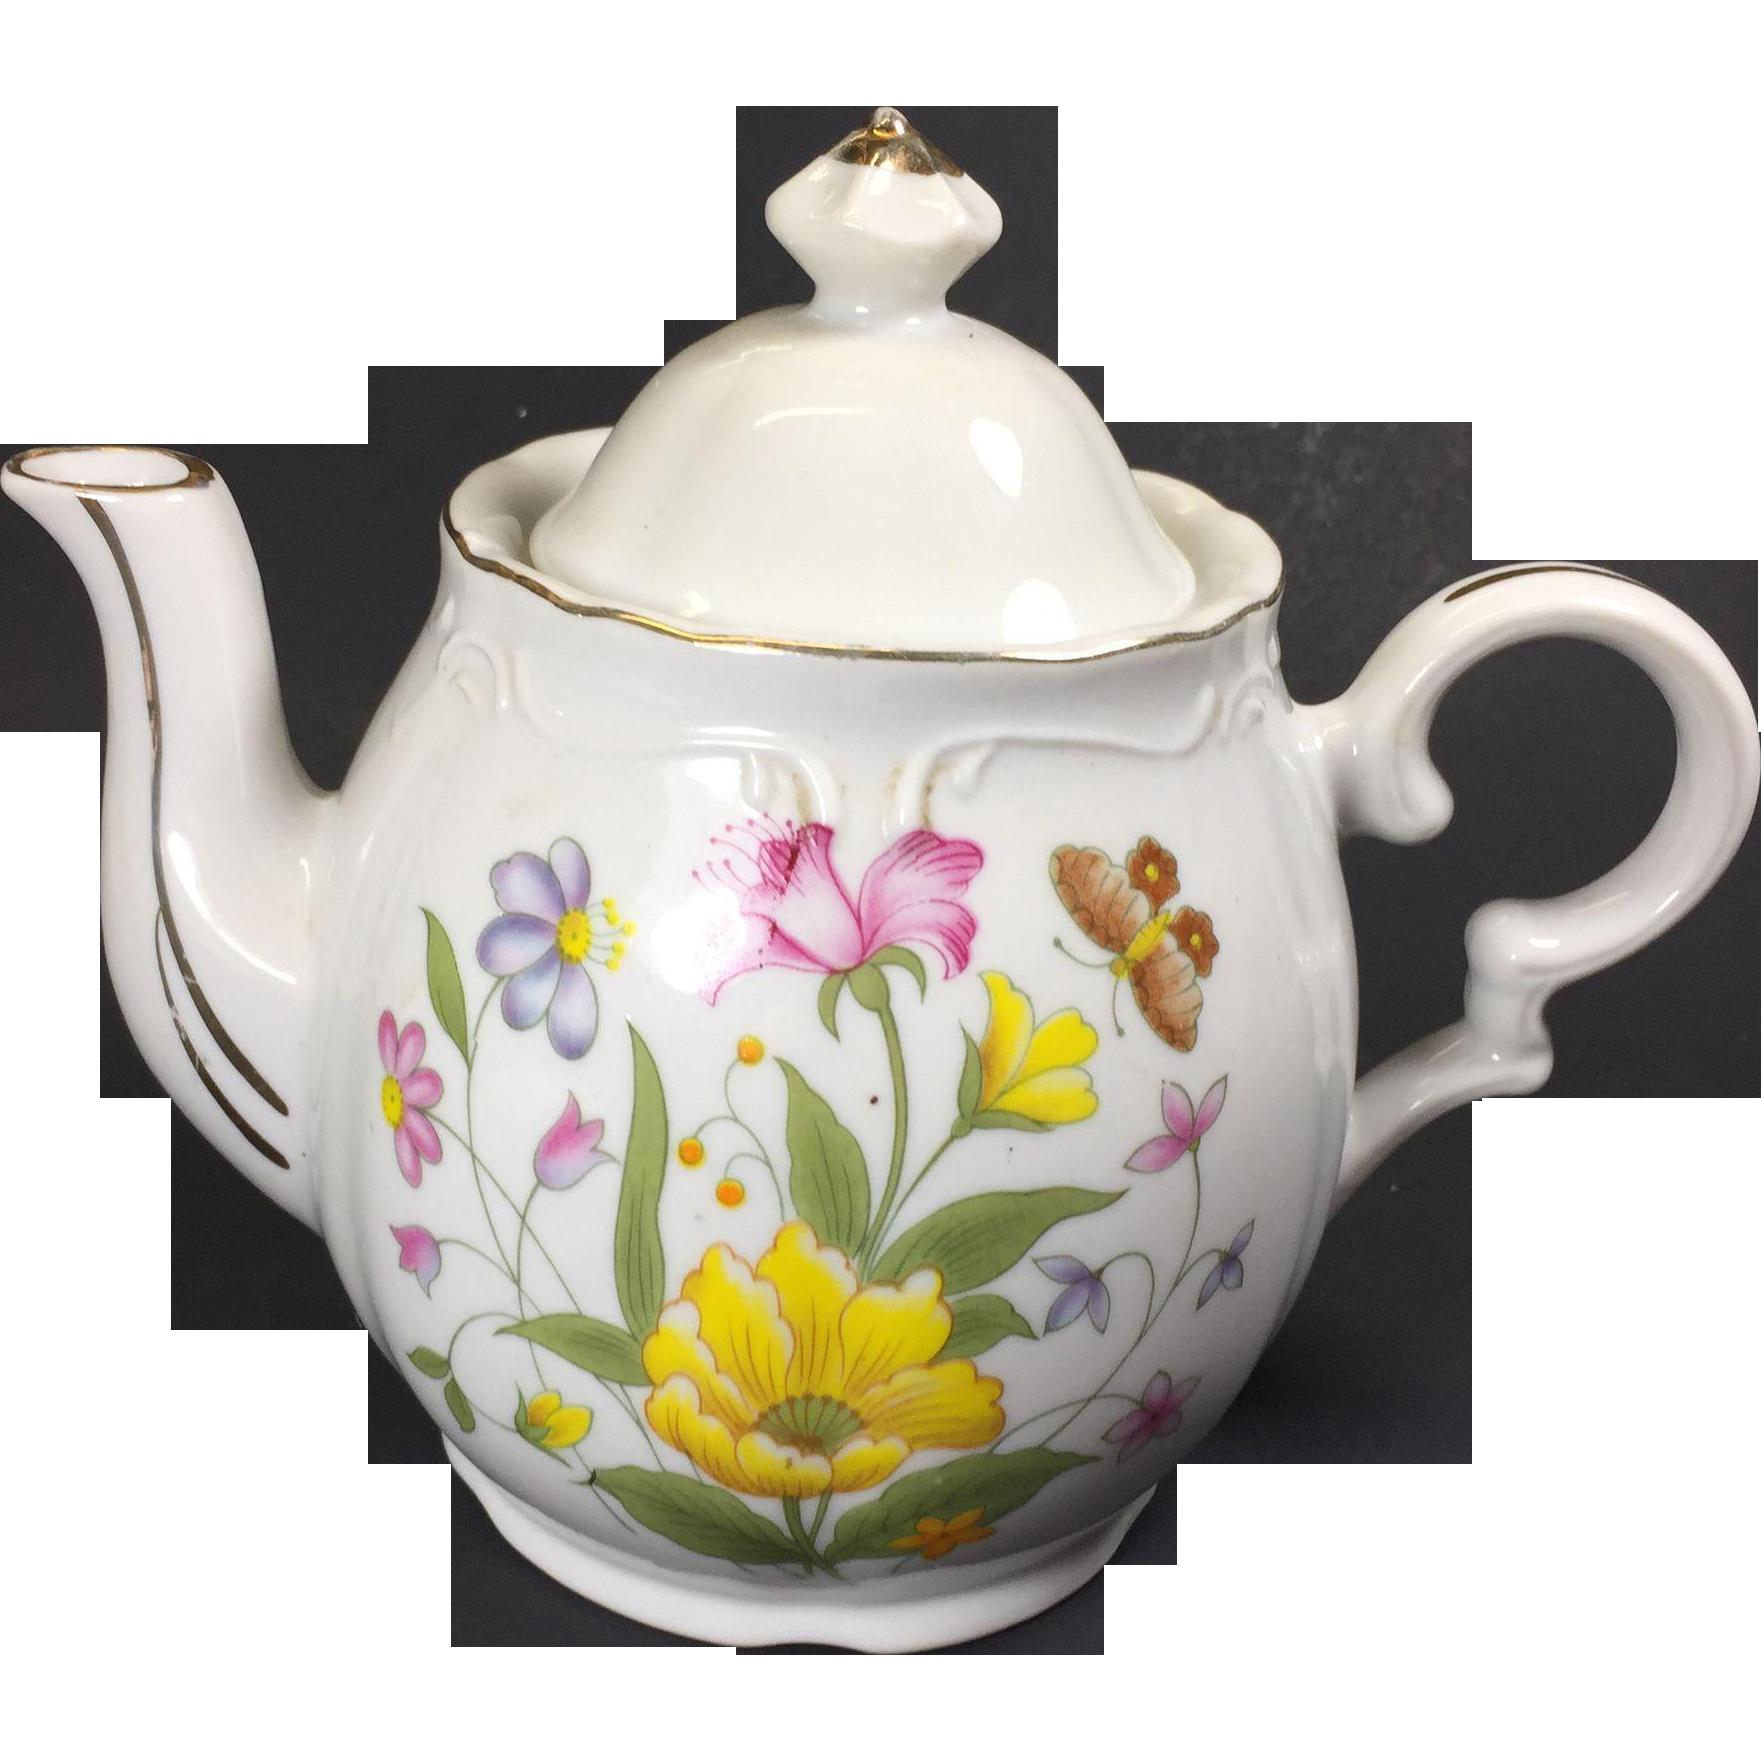 Vintage Musical Tea Pot Flowers Tea for Two